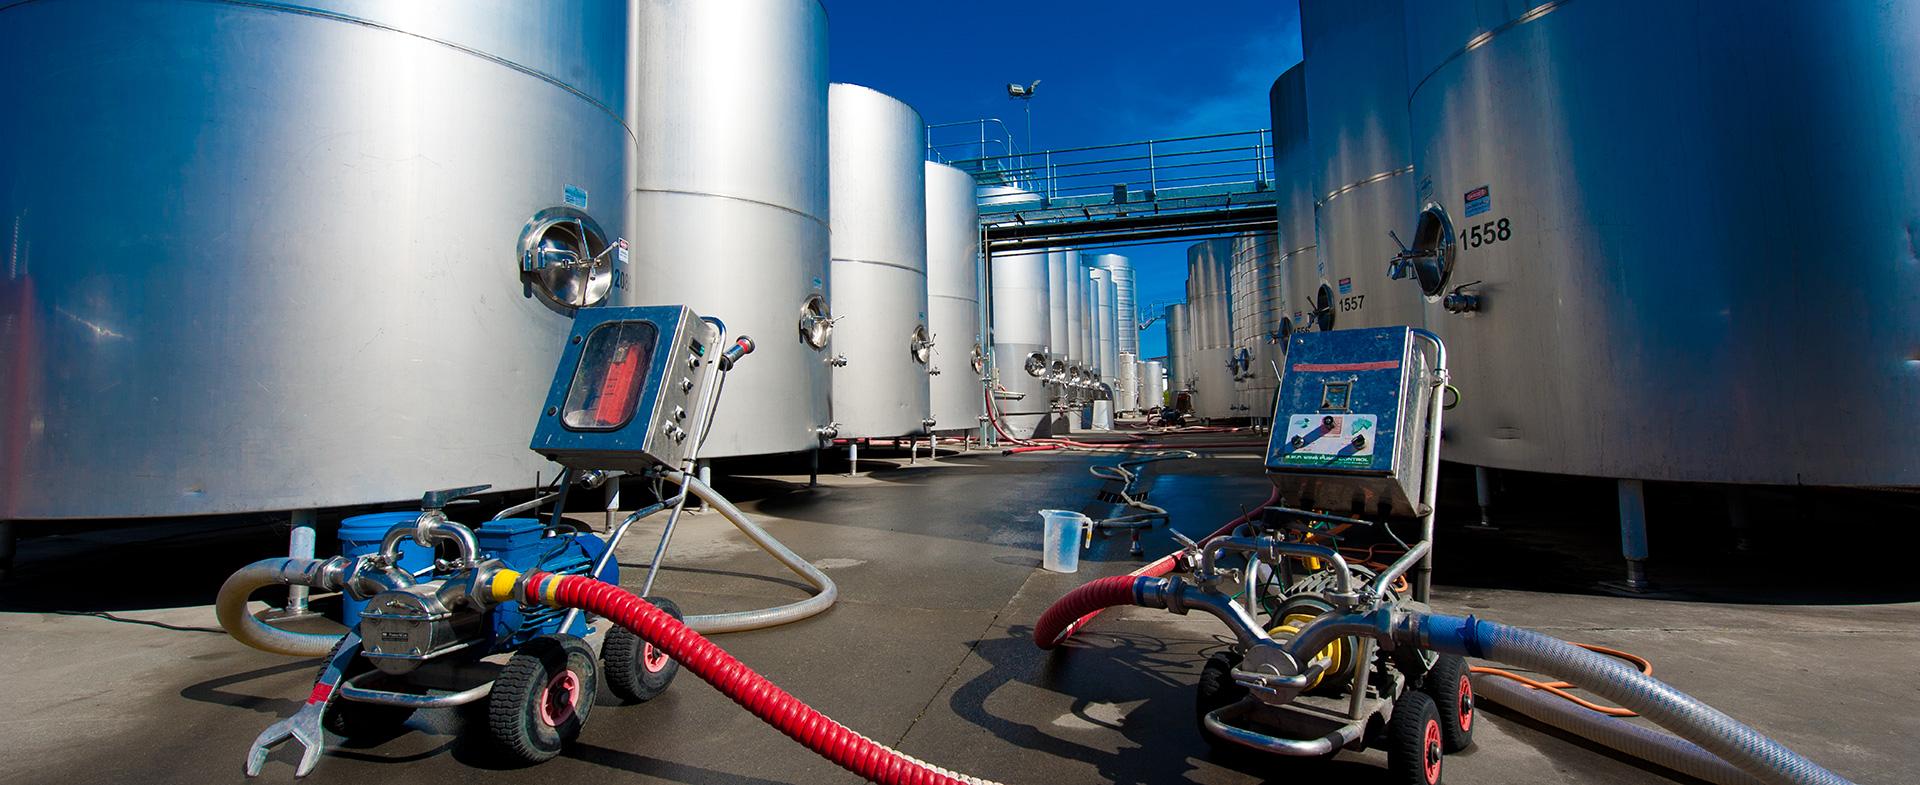 NZ Wineries Steven Ginders